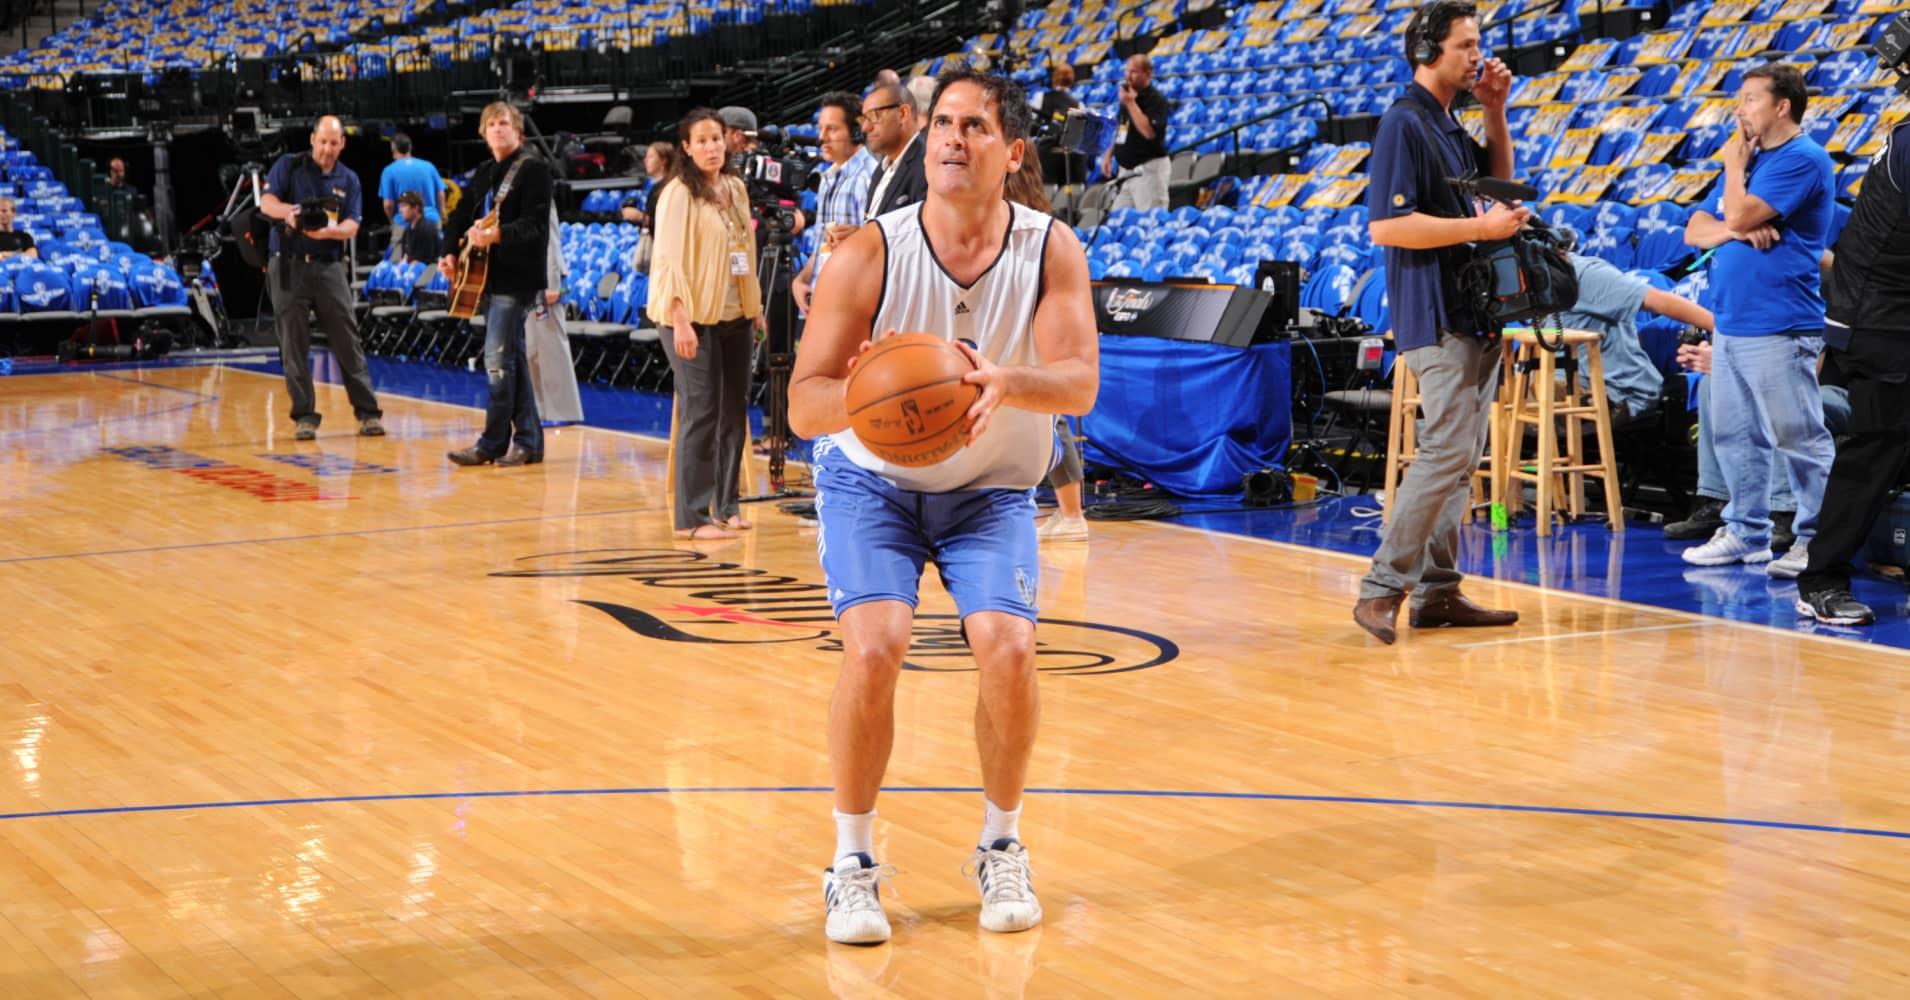 Mark Cuban, self-made billionaire and owner of the the Dallas Mavericks